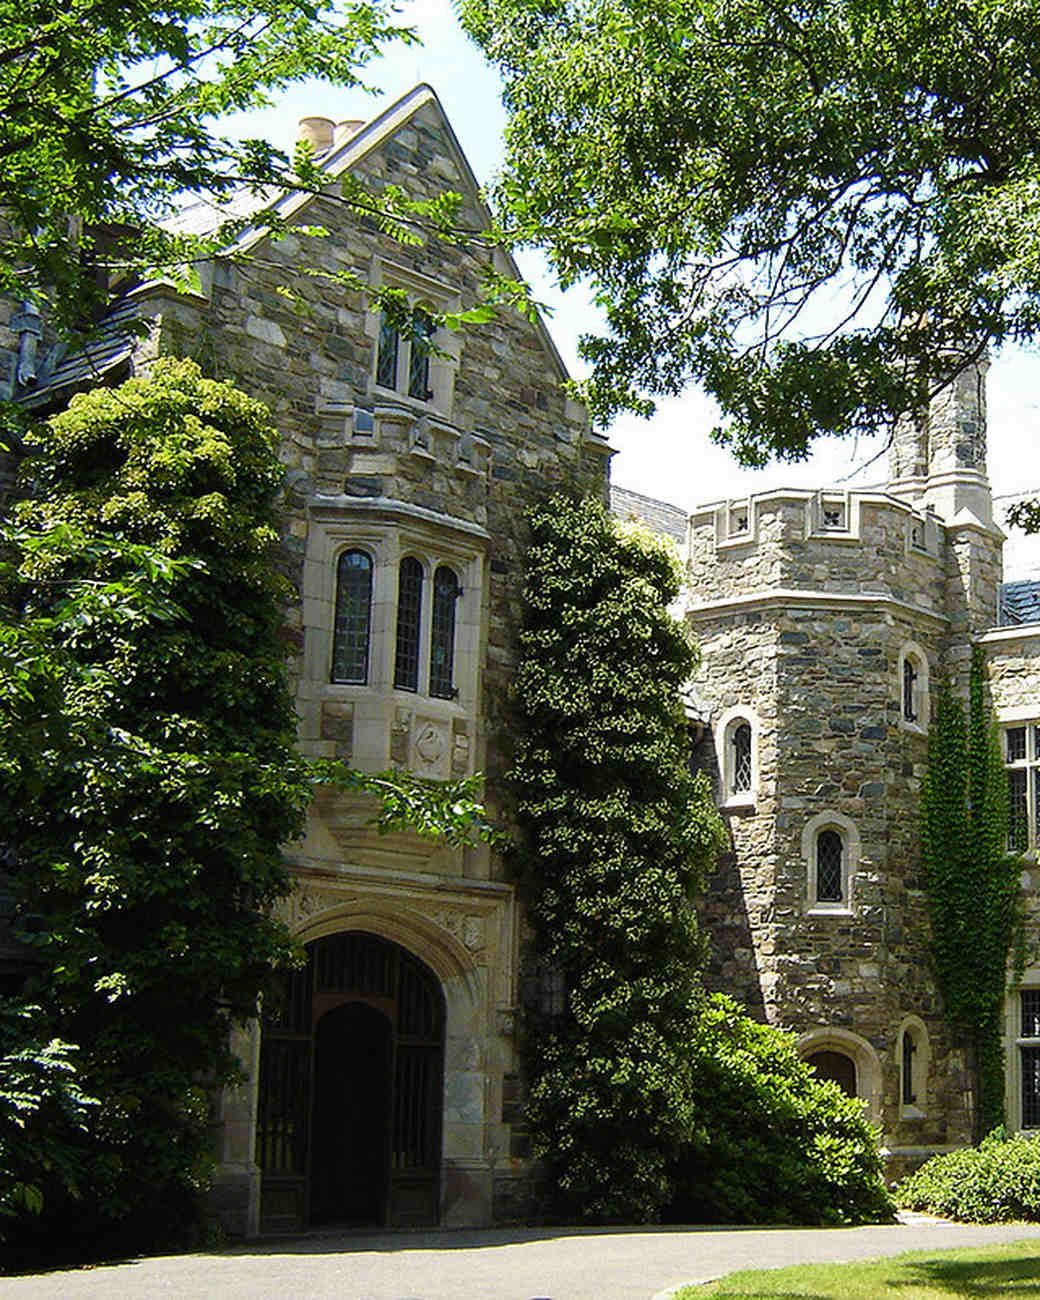 Castle Wedding Venues: 18 Fairy-Tale Castle Wedding Venues In America